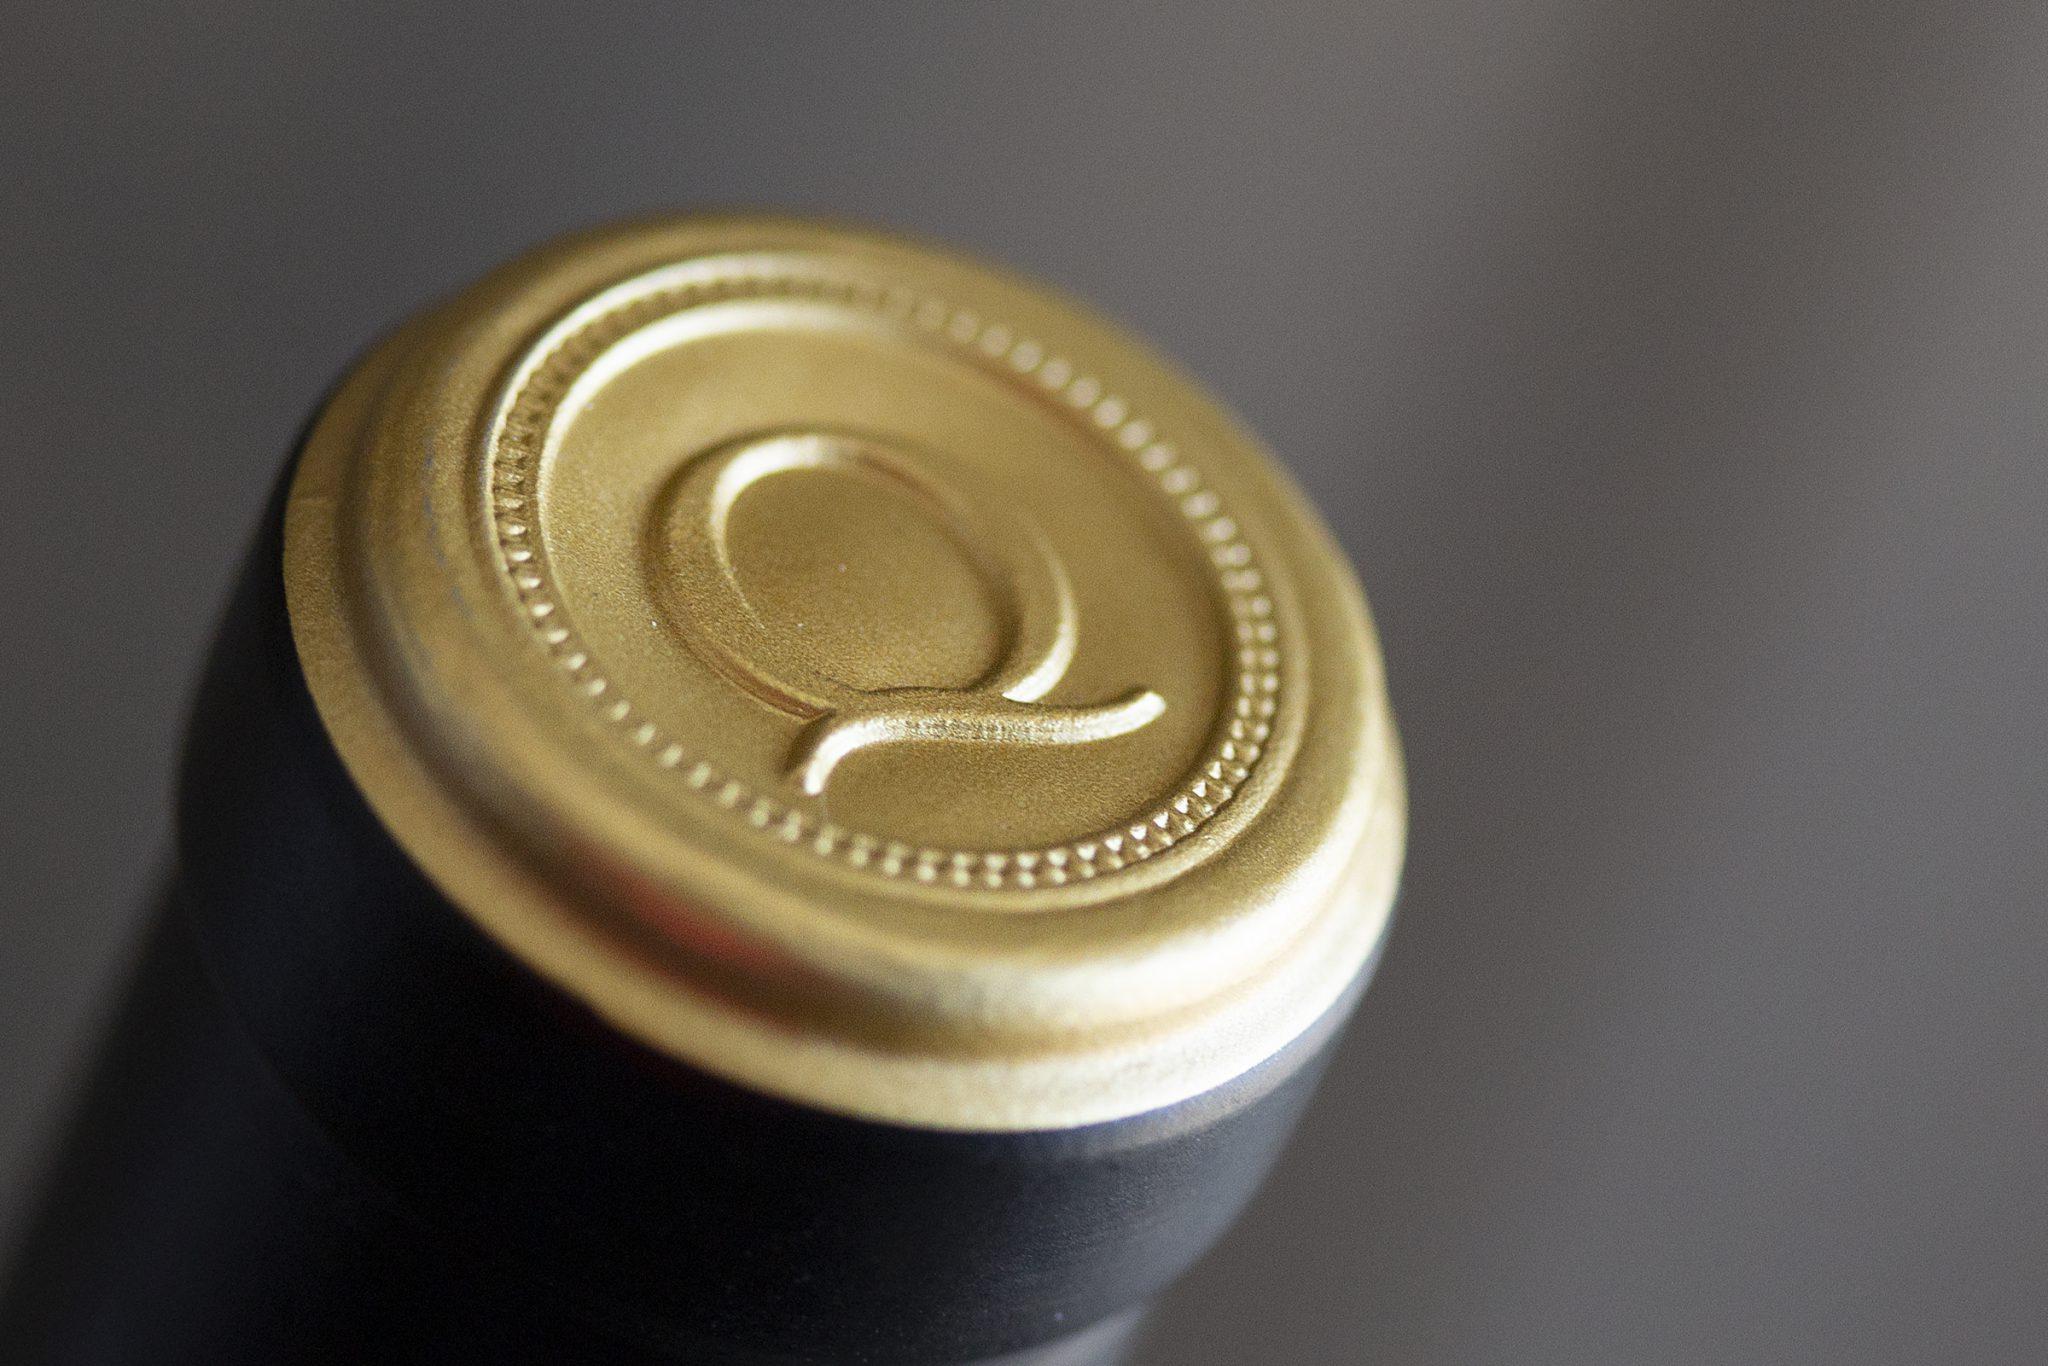 Black Boar by Quivira Wine Capsules